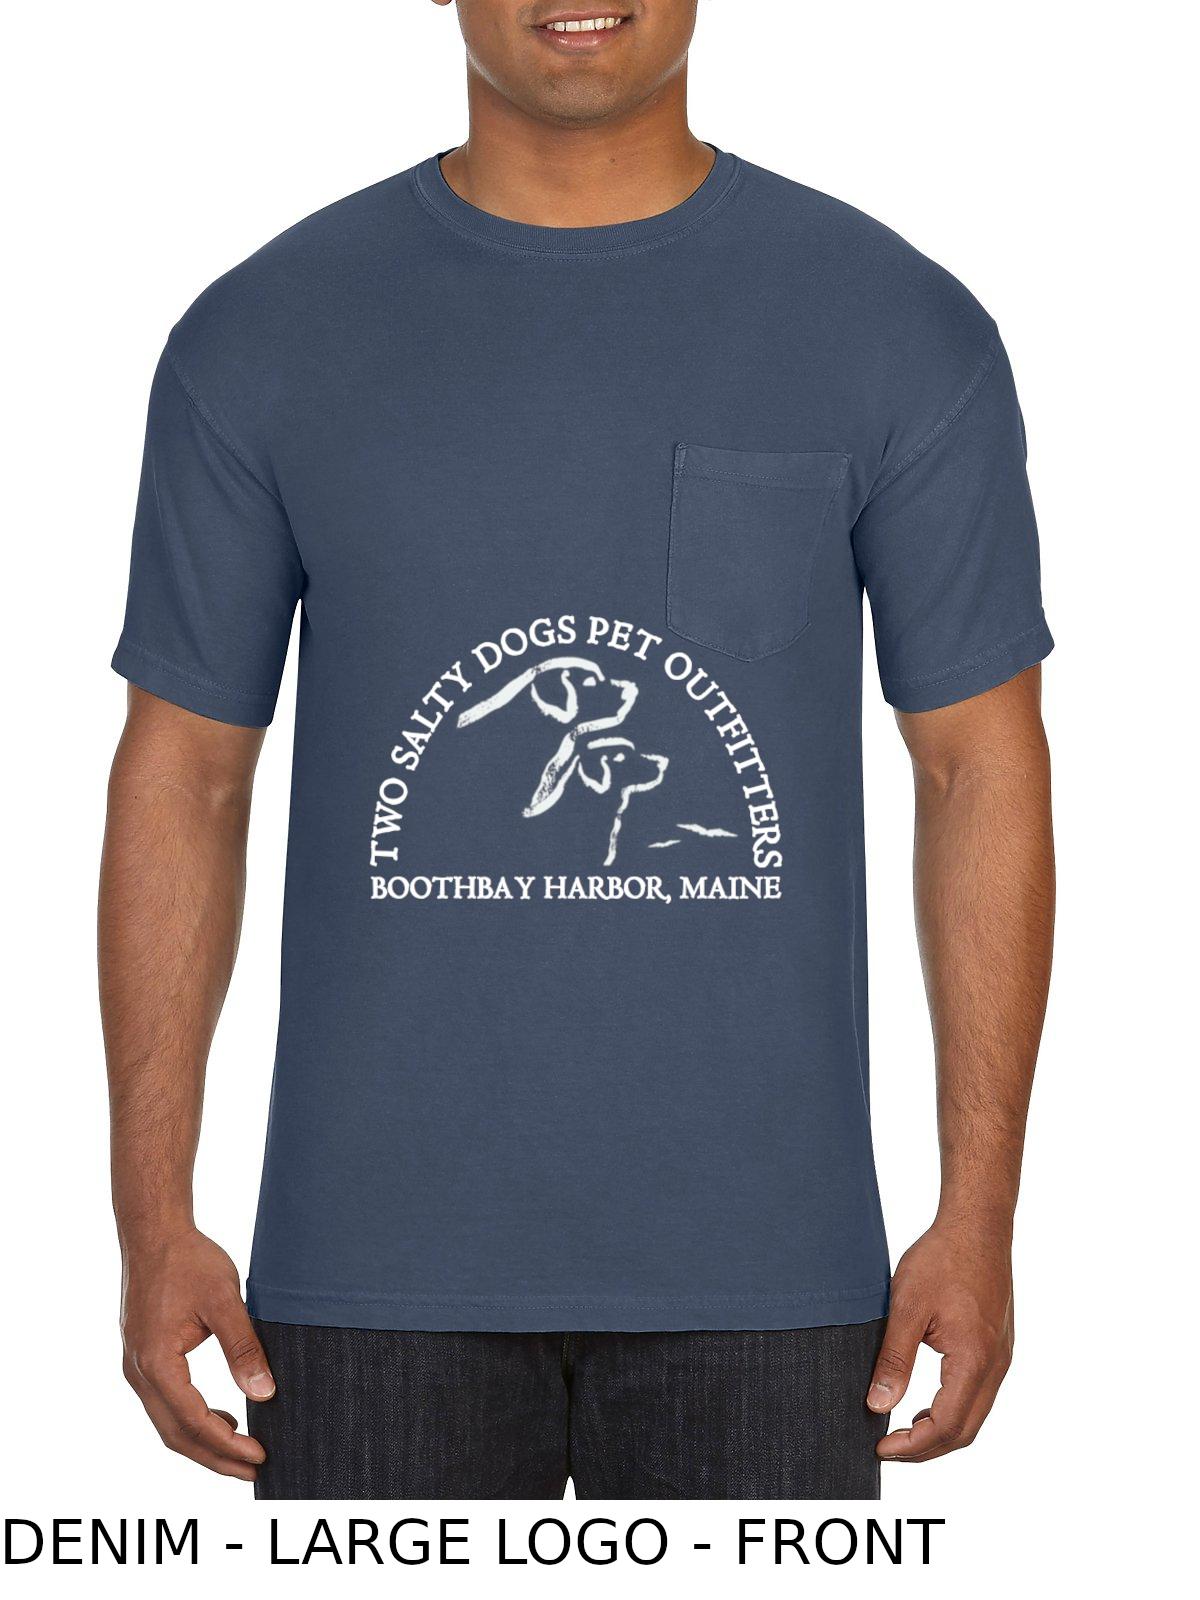 bbha-ss-t-shirt-pocket-denim-front